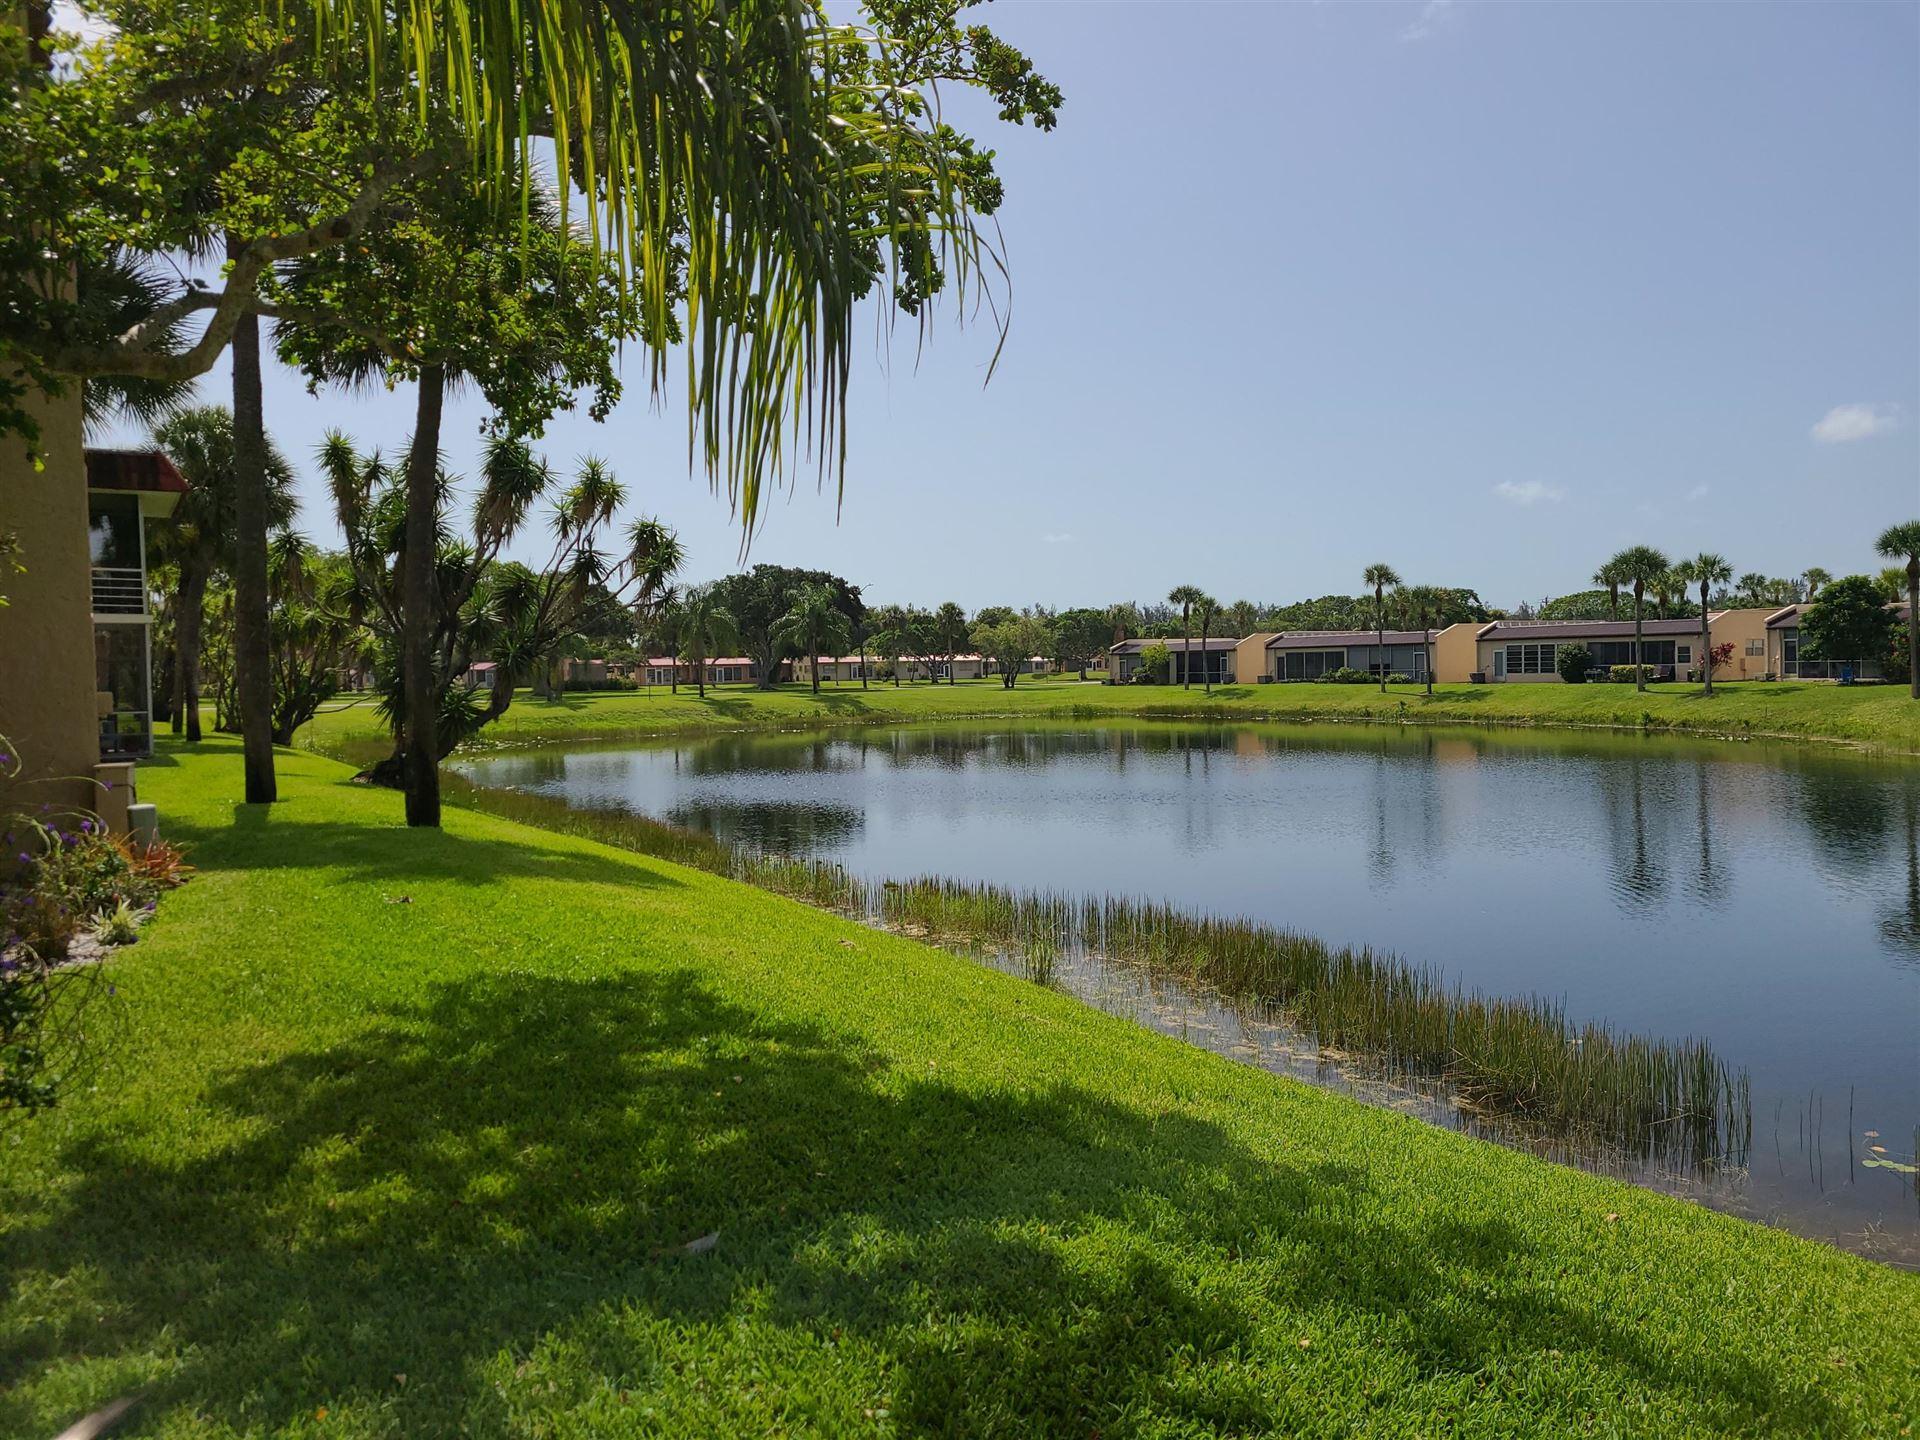 118 Lake Evelyn Drive, West Palm Beach, FL 33411 - #: RX-10643188